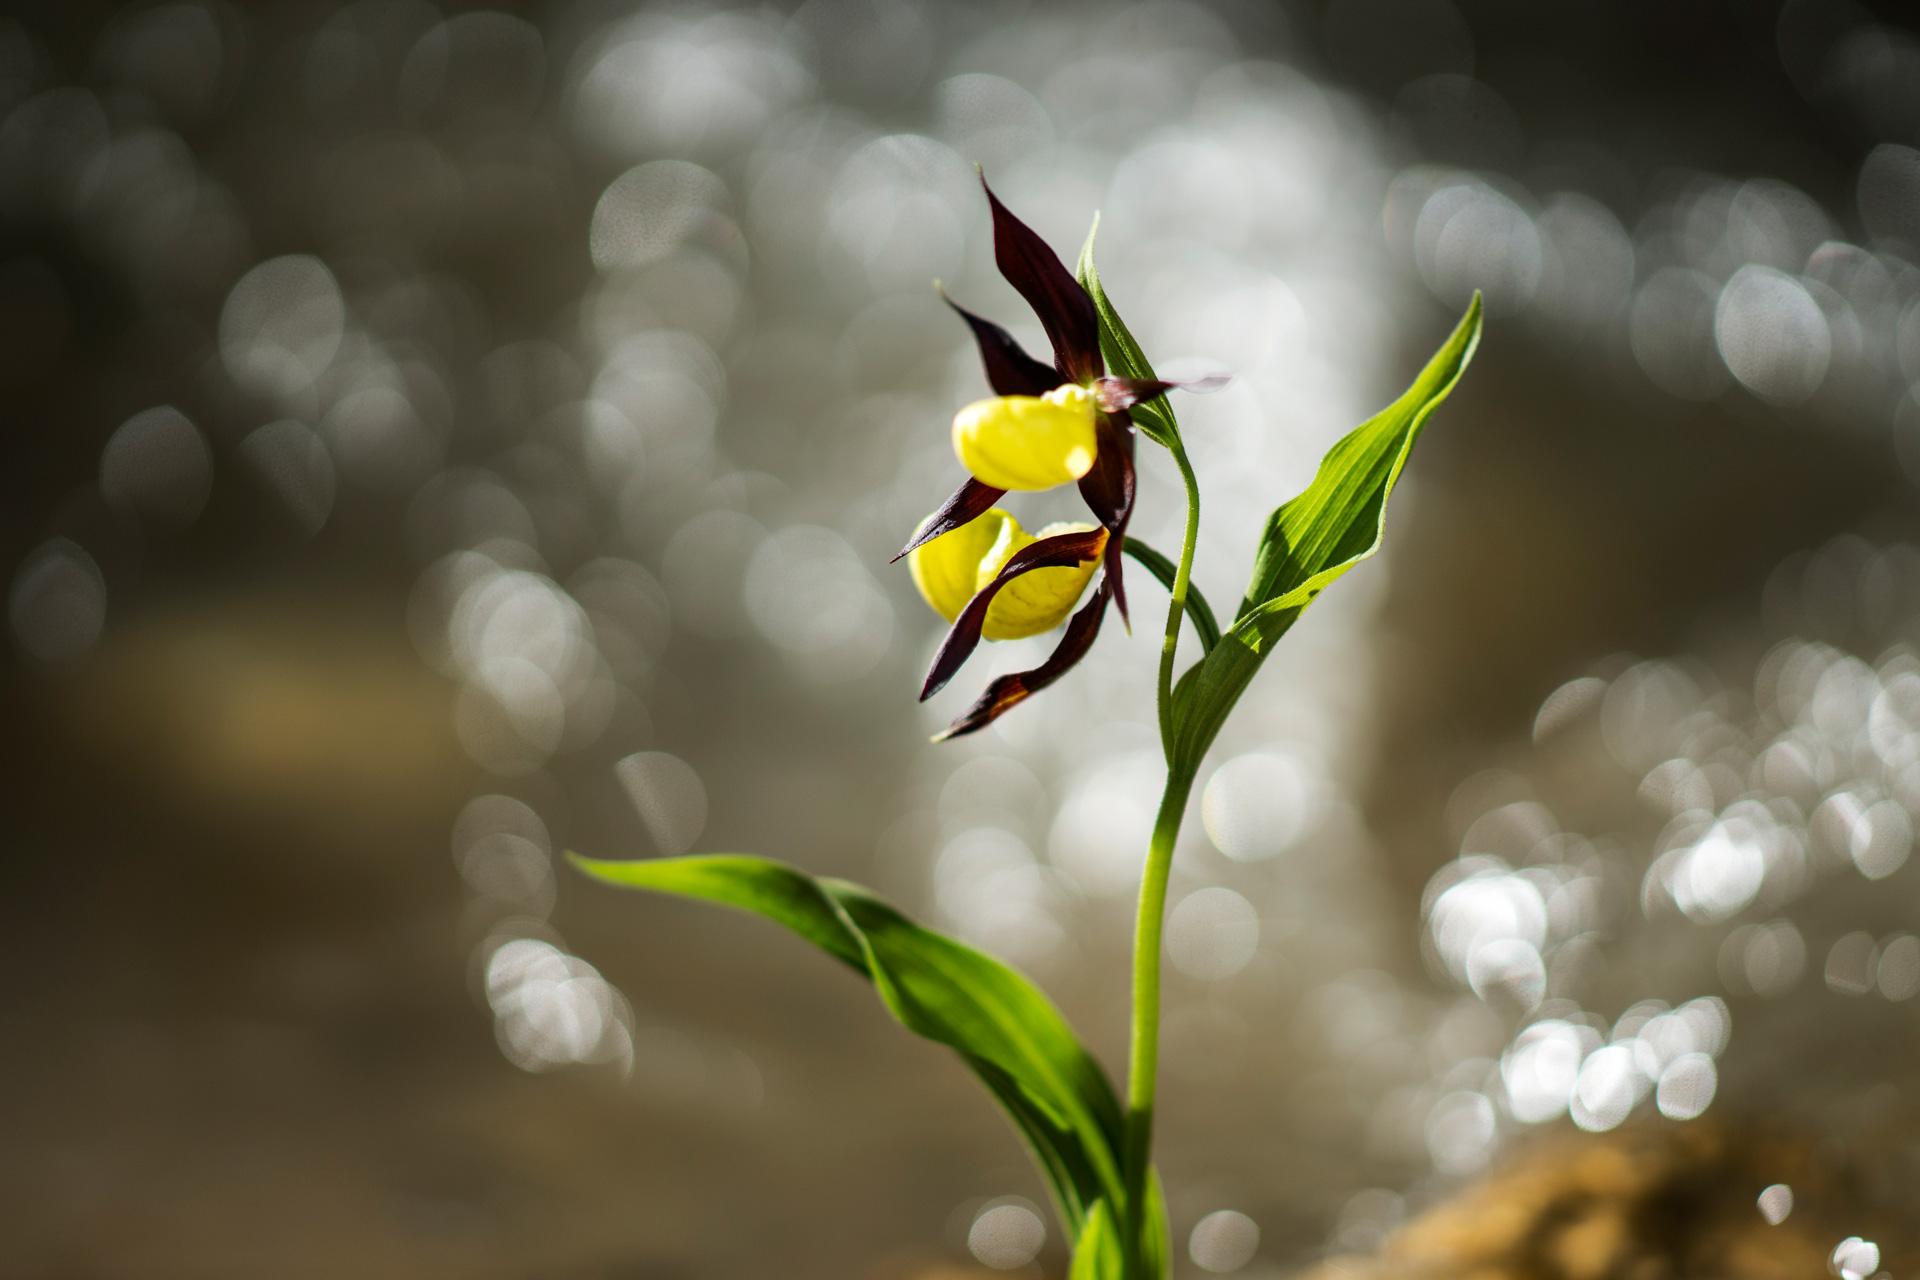 Orchid (Madonna's Shoe)...